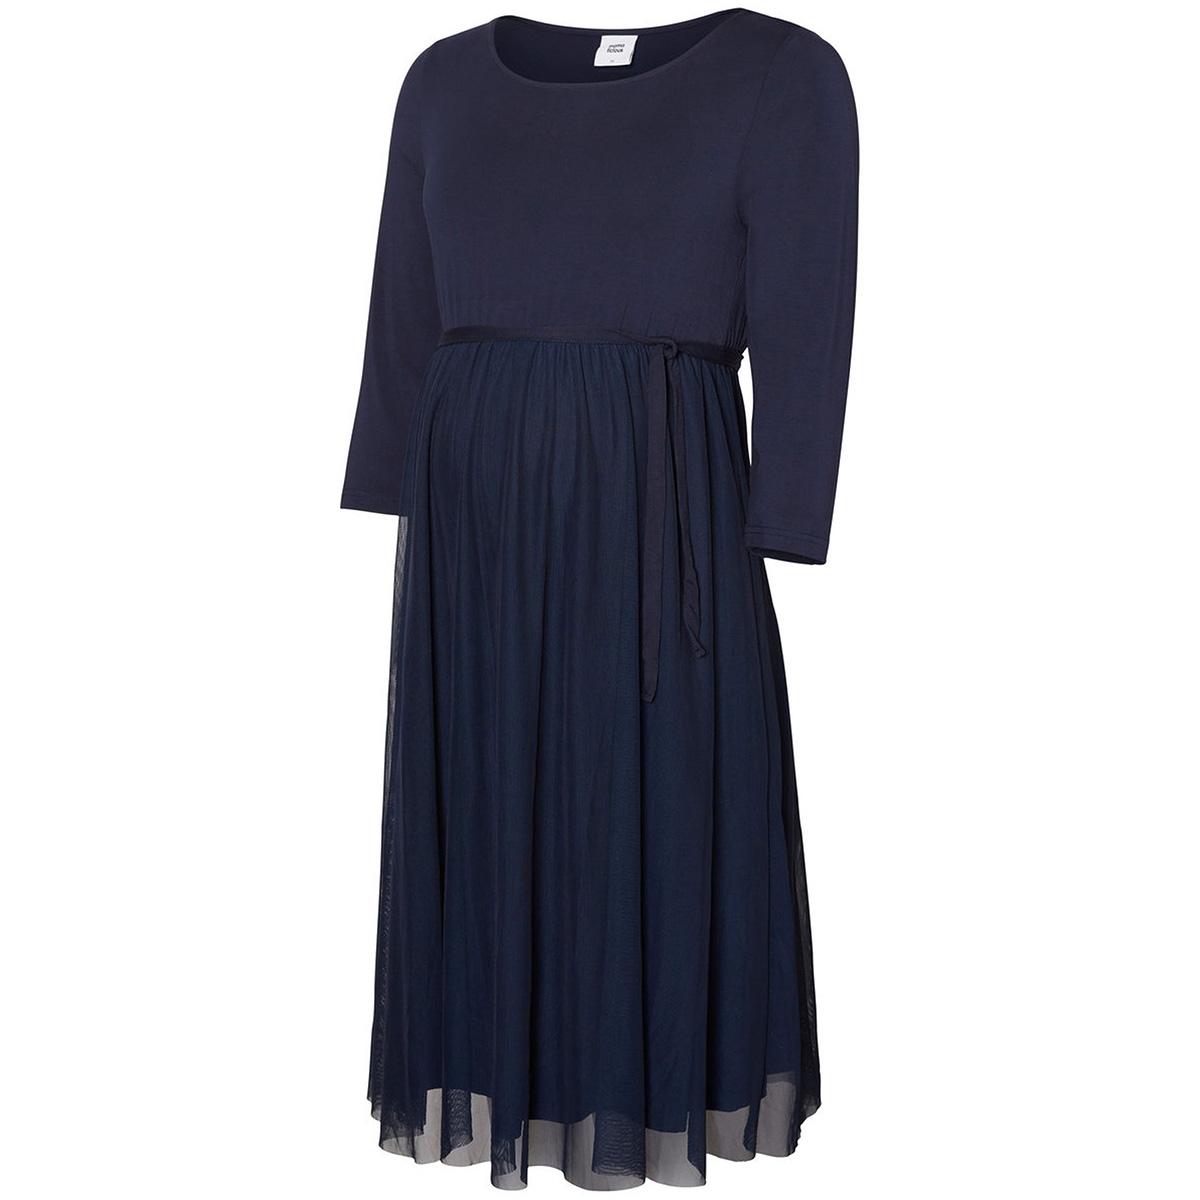 mlbianka 3/4 abk jersey dress 20007895 mama-licious positie jurk navy blazer